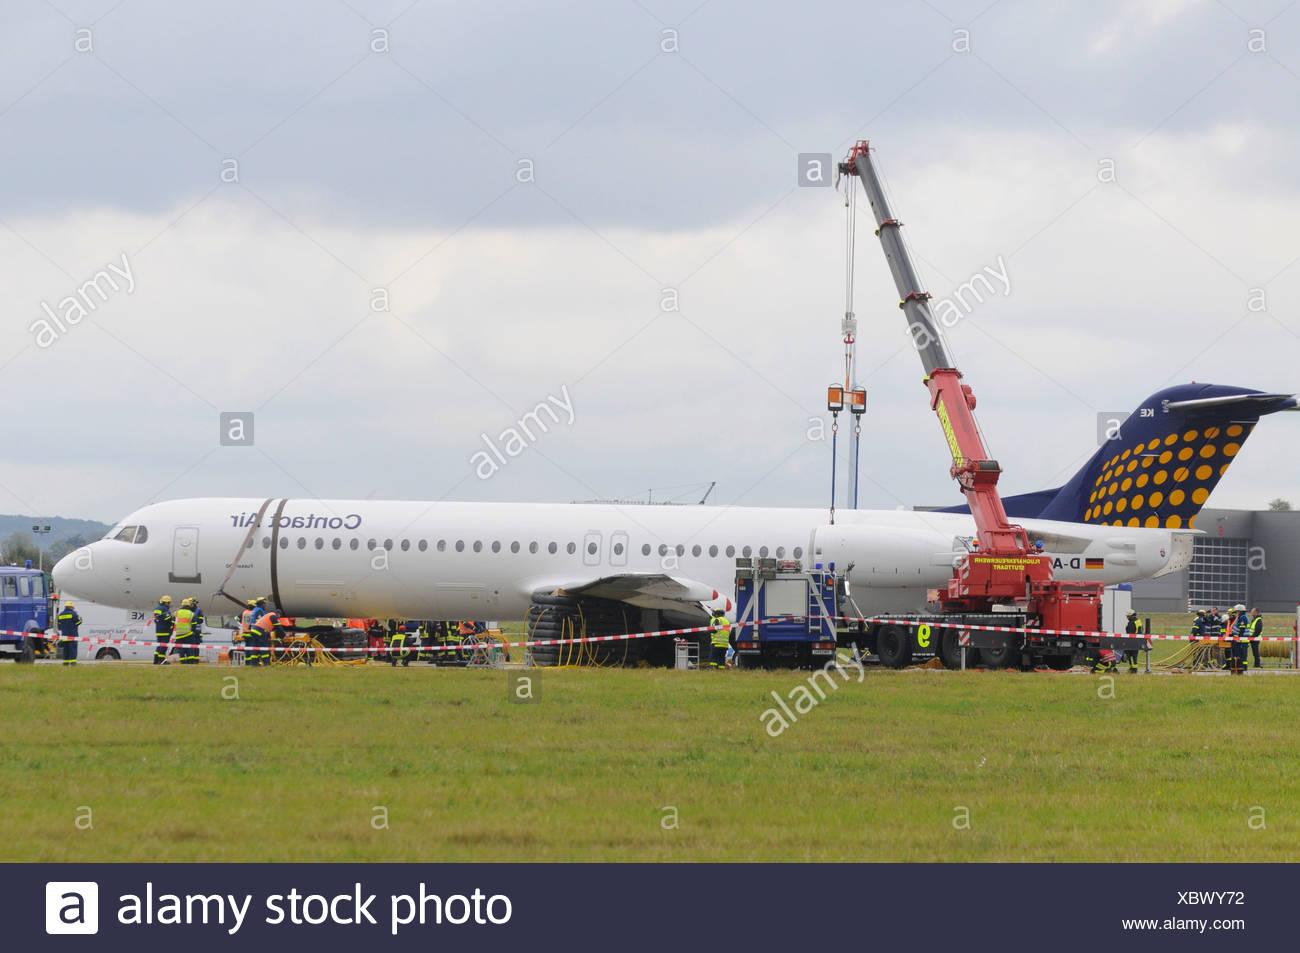 Emergency landing of a CONTACT air machine at Stuttgart airport, landing gear failure, SPD leader Franz Muentefering, on the wa - Stock Image